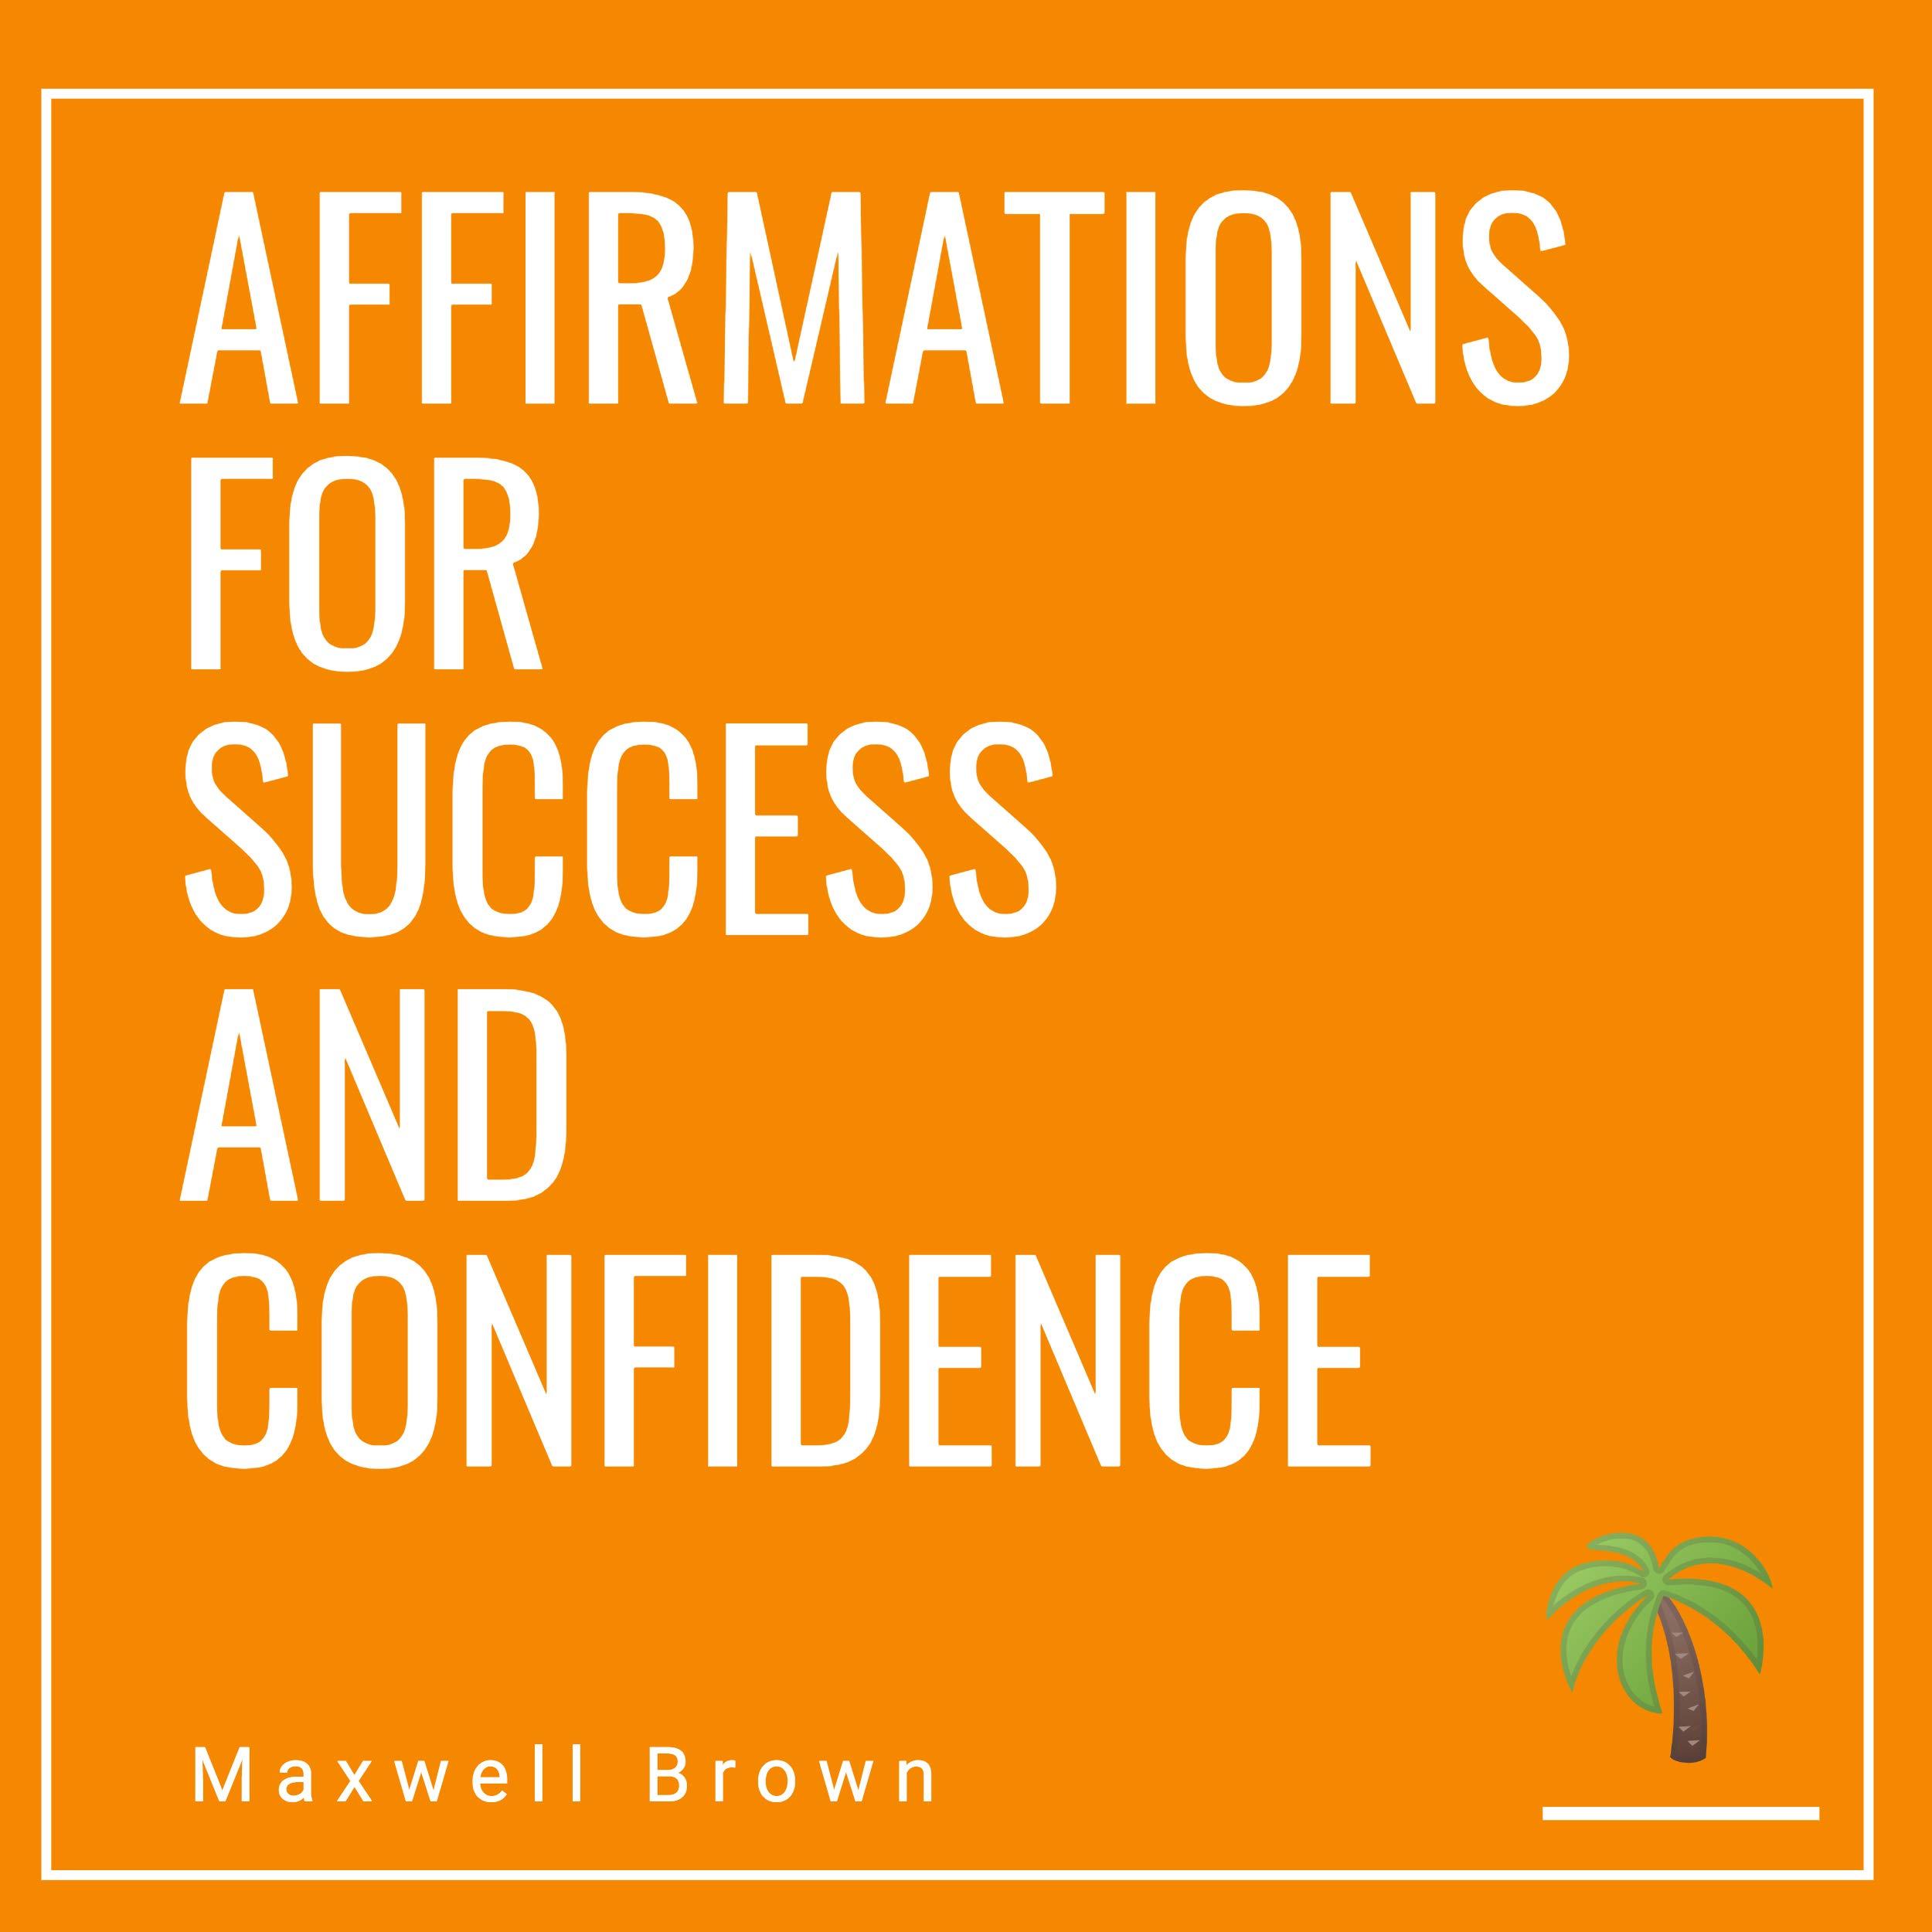 Affirmations self for esteem positive daily 20 POSITIVE